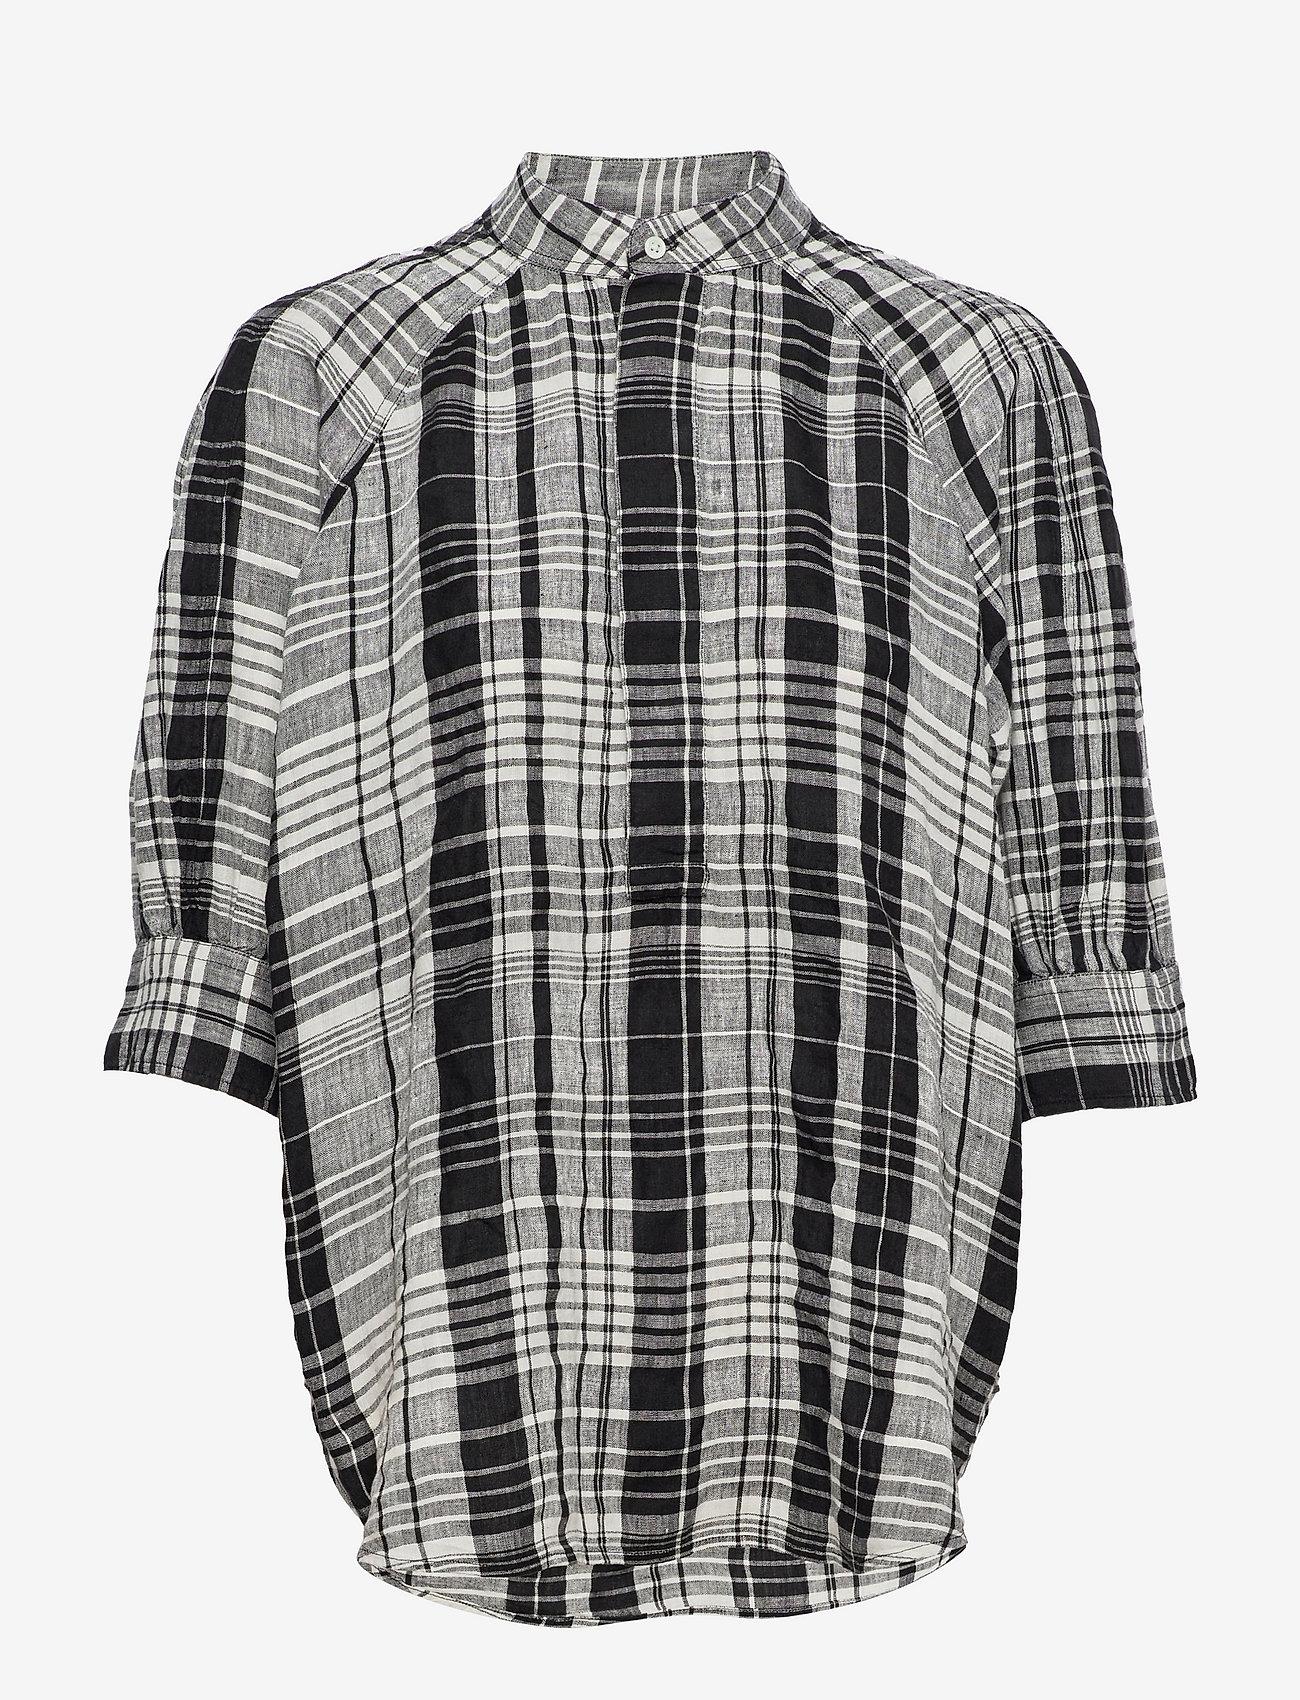 Polo Ralph Lauren - SS CICI ST-ELBOW SLEEVE-SHIRT - long-sleeved shirts - 1088 polo black/ - 0